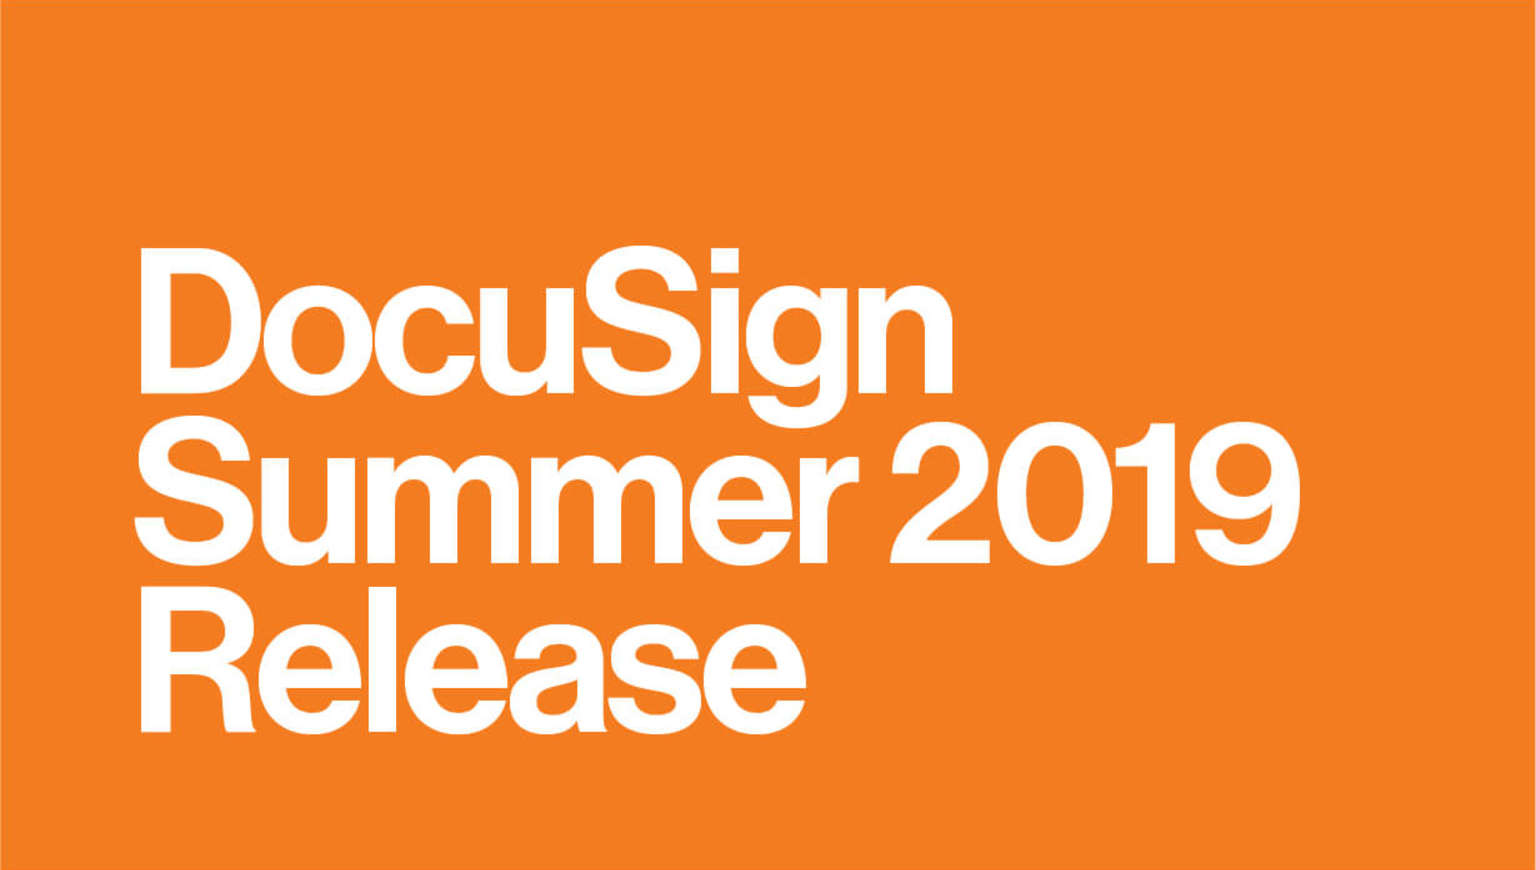 DocuSign Summer 2019 Release